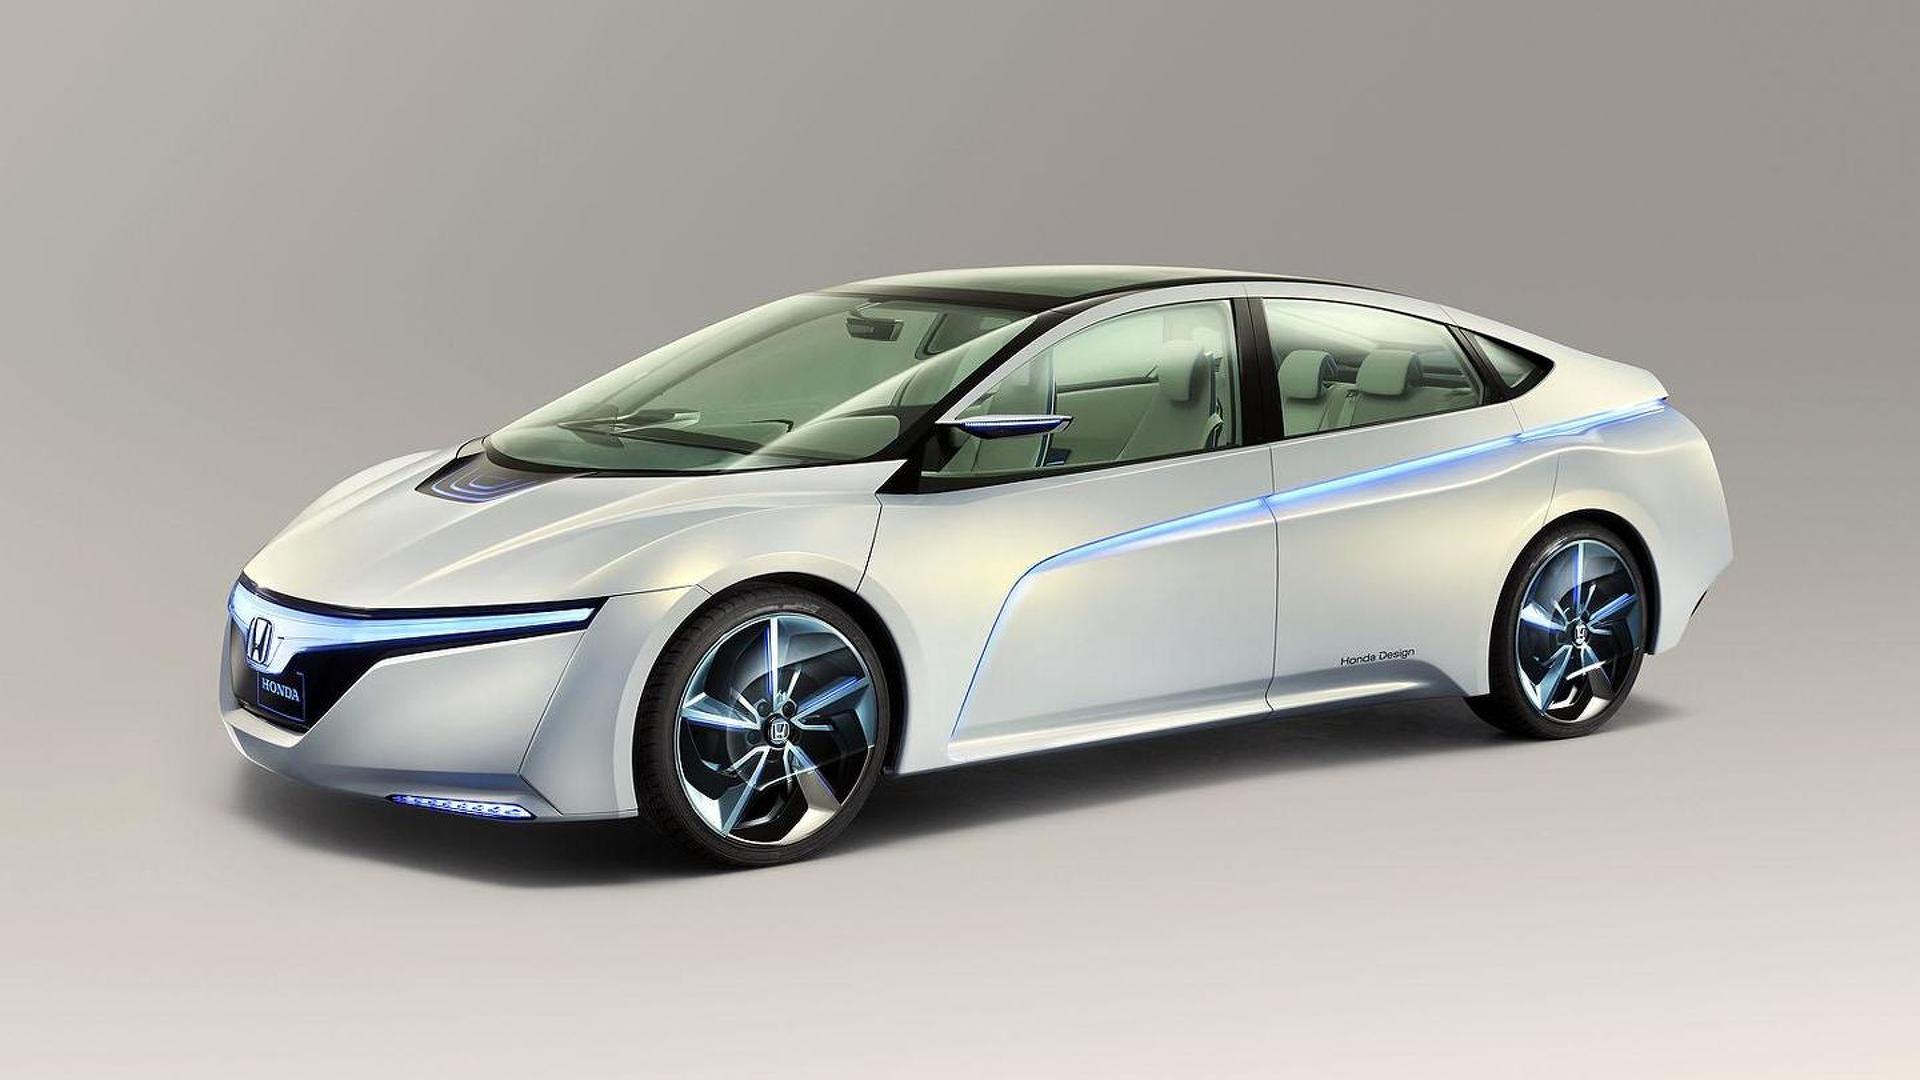 Honda announces several concepts for Tokyo Motor Show 2011